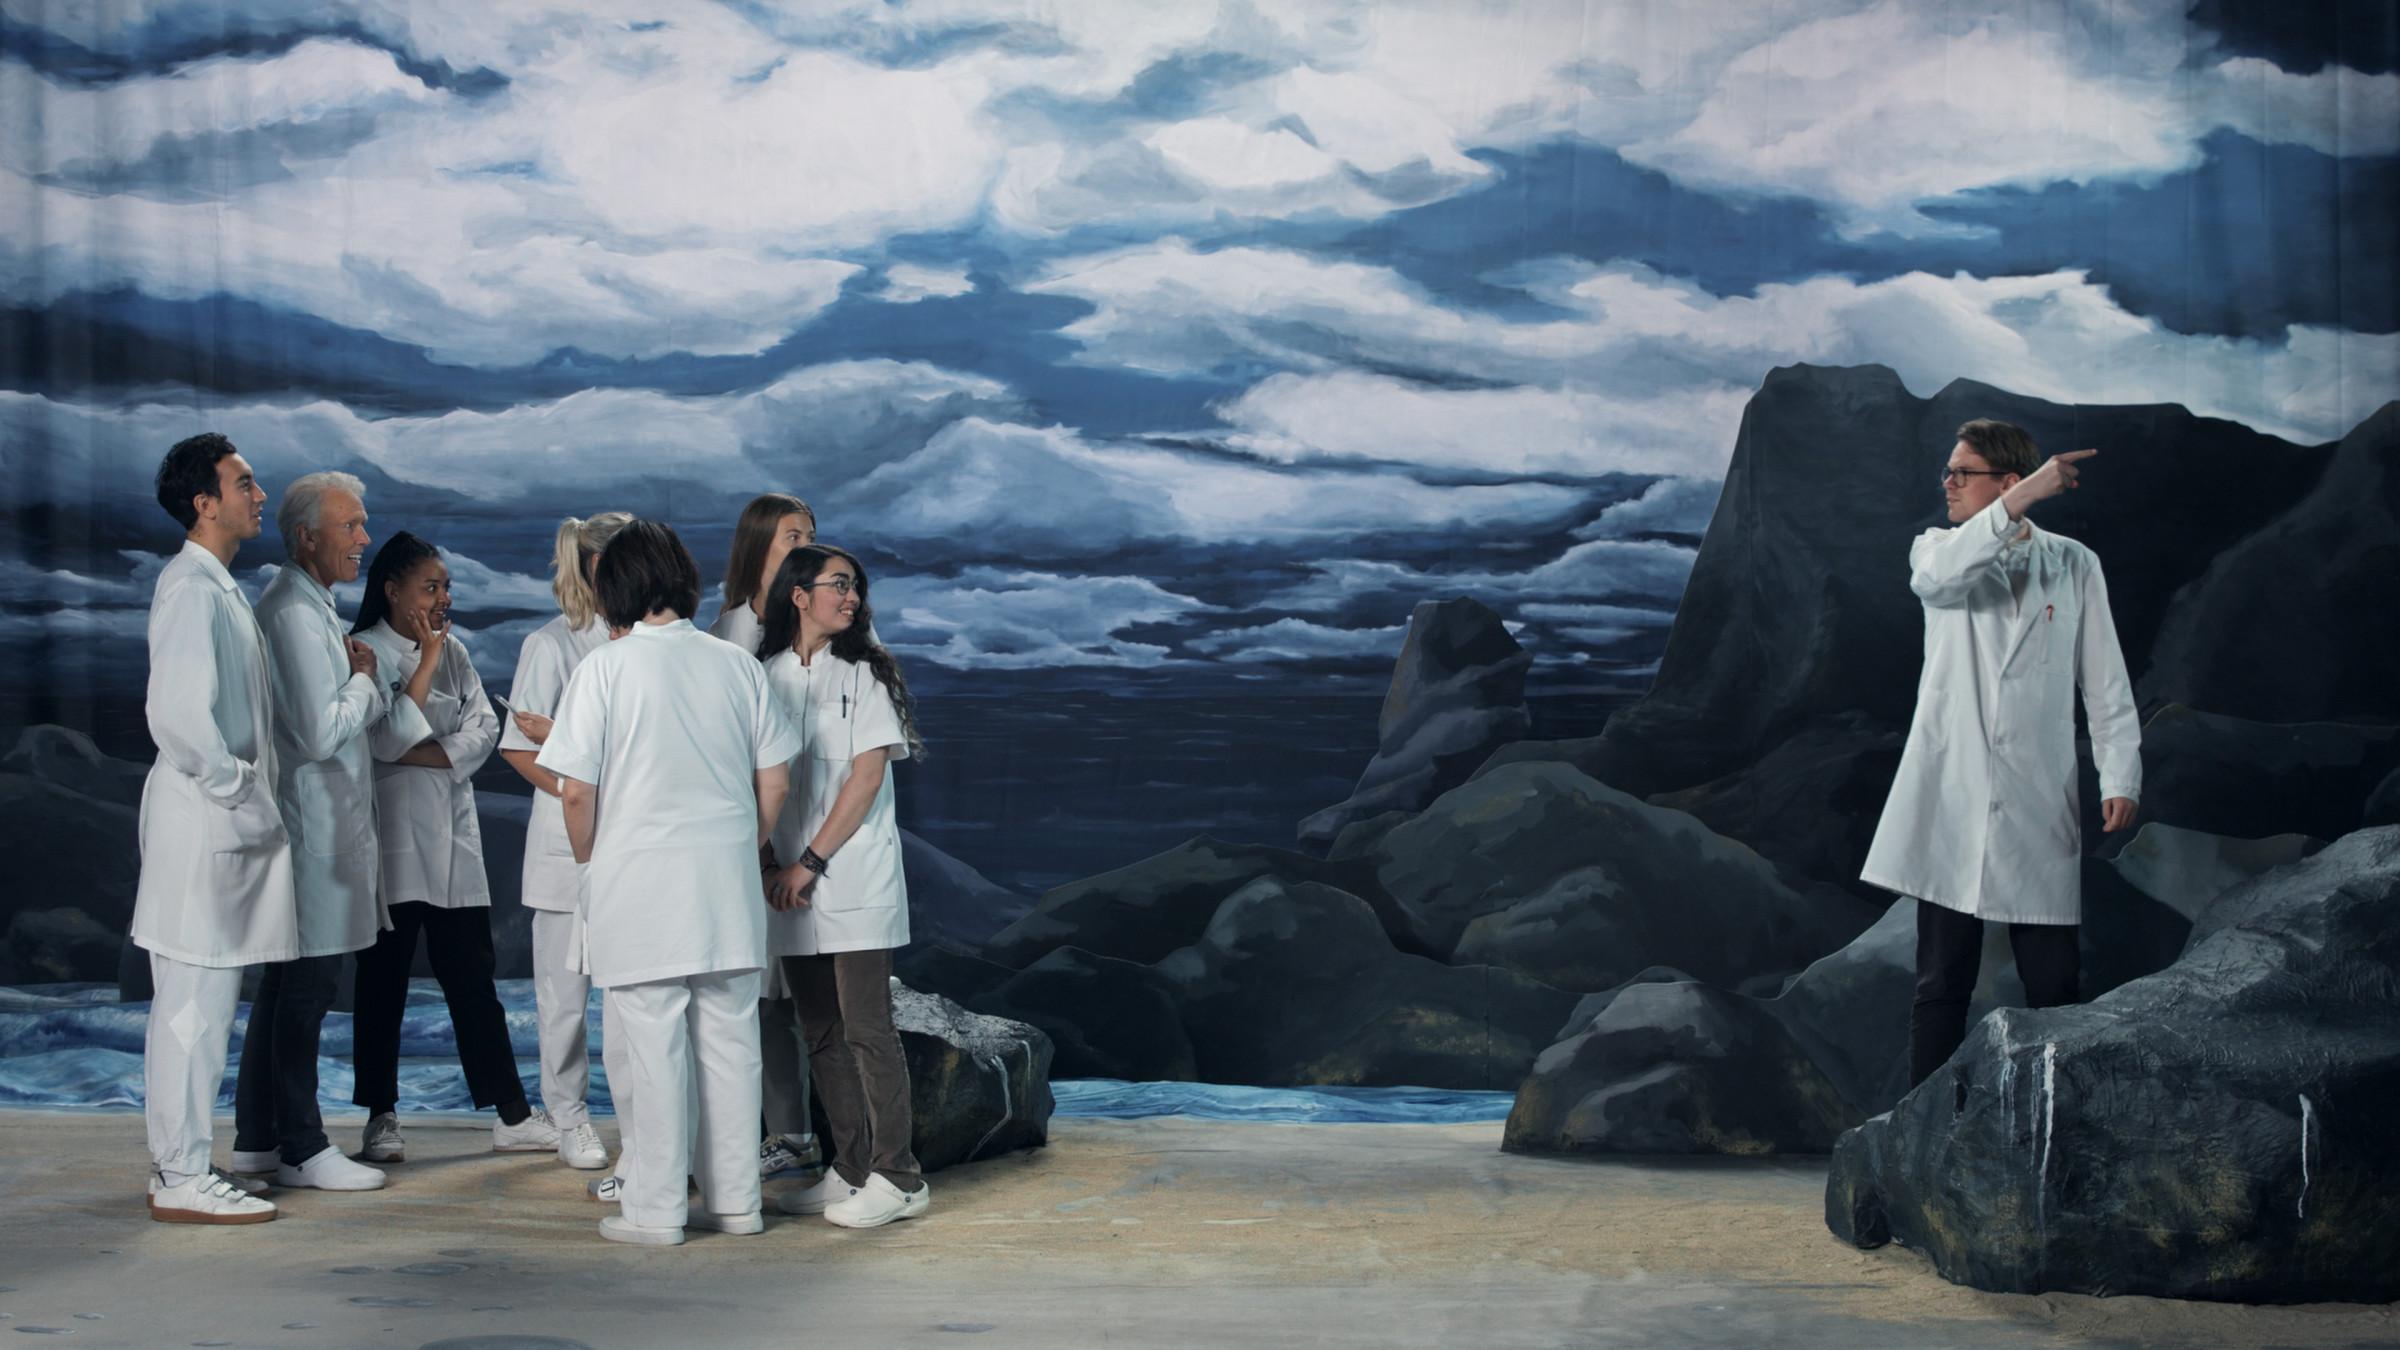 <span class=&#34;link fancybox-details-link&#34;><a href=&#34;/exhibitions/168/works/artworks15768/&#34;>View Detail Page</a></span><div class=&#34;artist&#34;><strong>RAGNAR KJARTANSSON</strong></div><div class=&#34;title&#34;><em>Figures in Landscape (Wednesday)</em>, 2018</div><div class=&#34;medium&#34;>single channel video</div><div class=&#34;dimensions&#34;>video, 24 hours</div><div class=&#34;edition_details&#34;>Edition of 6 plus 2 artist's proofs</div>